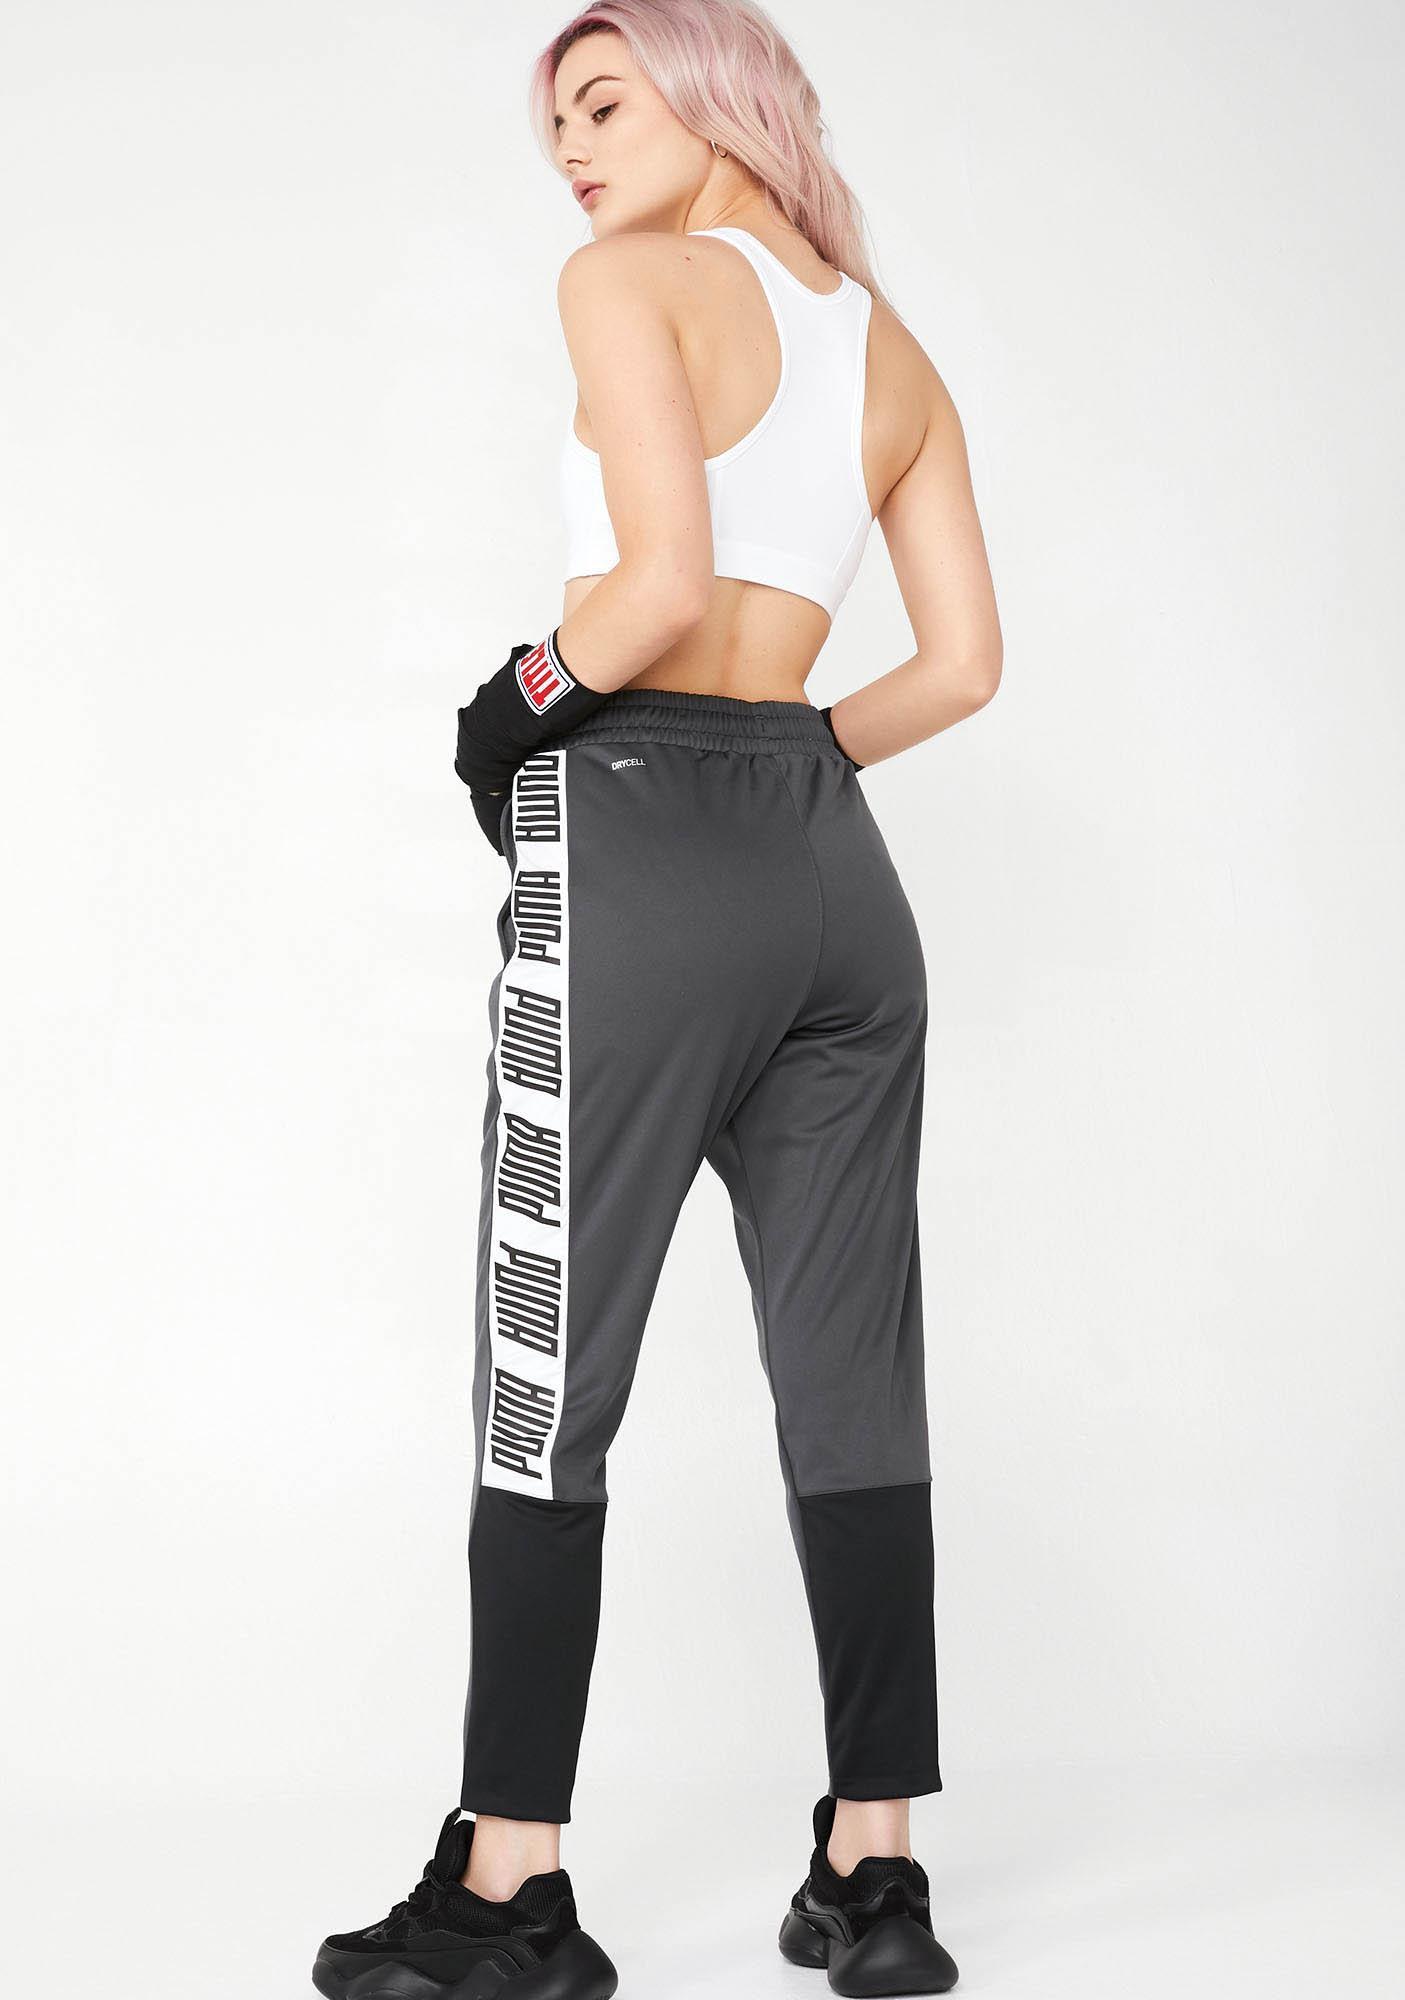 PUMA A.C.E. Track Pants